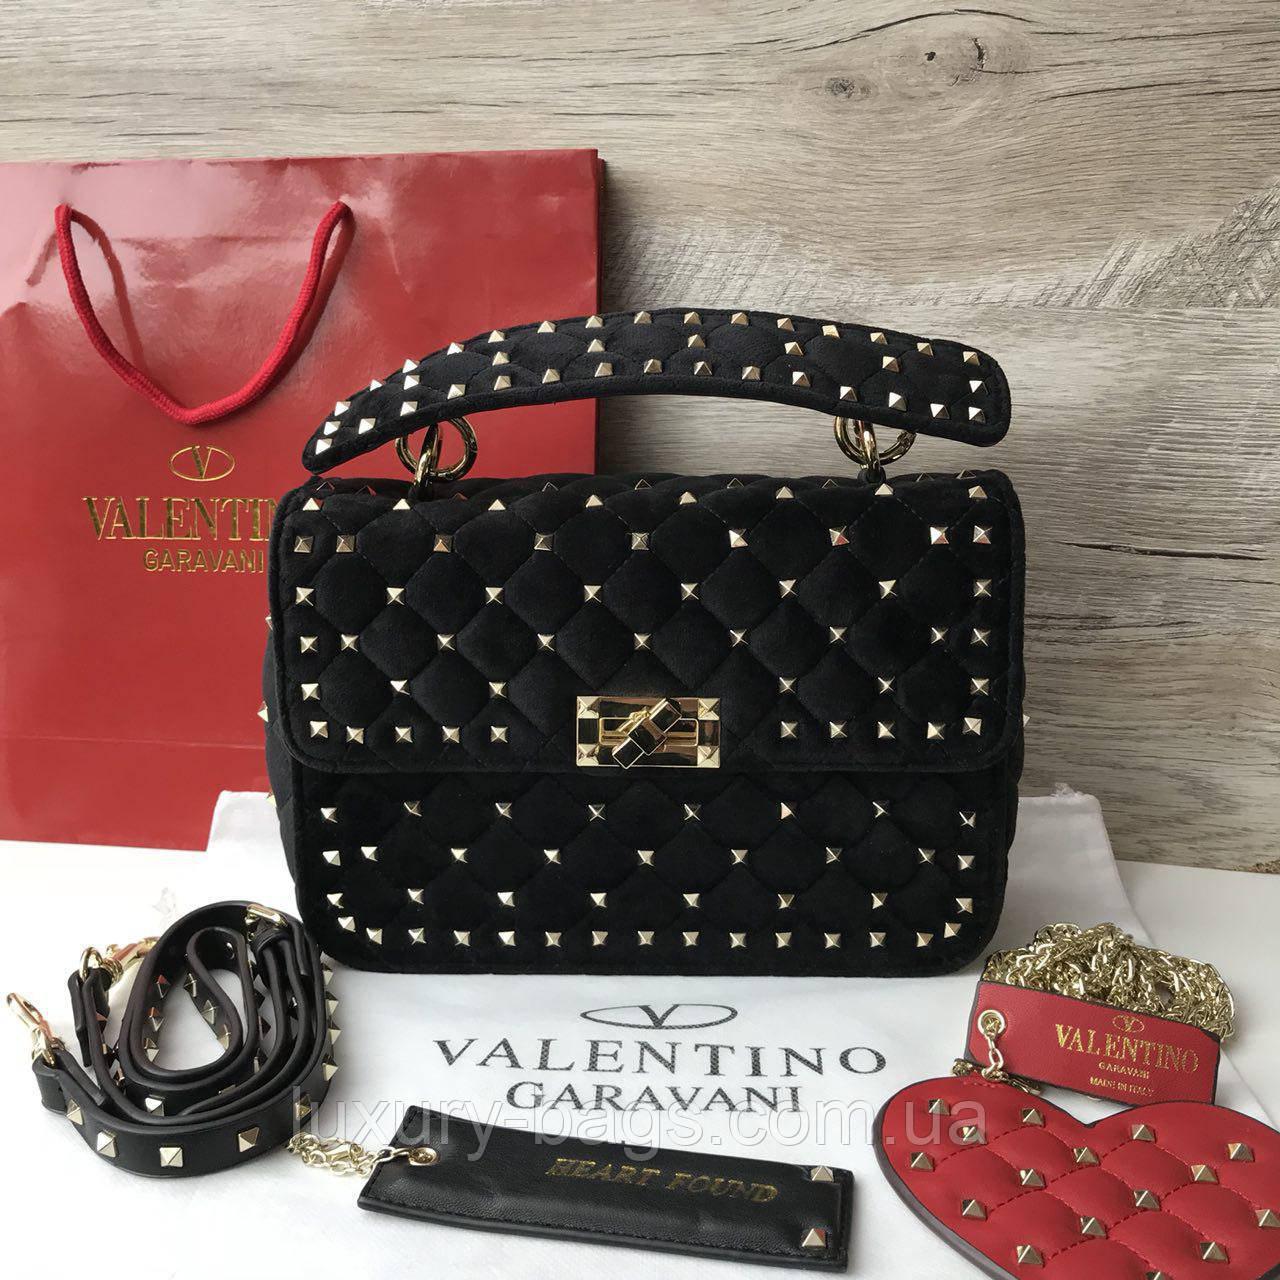 6f5bd0e1cbf0 Женская сумка Valentino Валентино опт, цена 1 351 грн., купить в ...